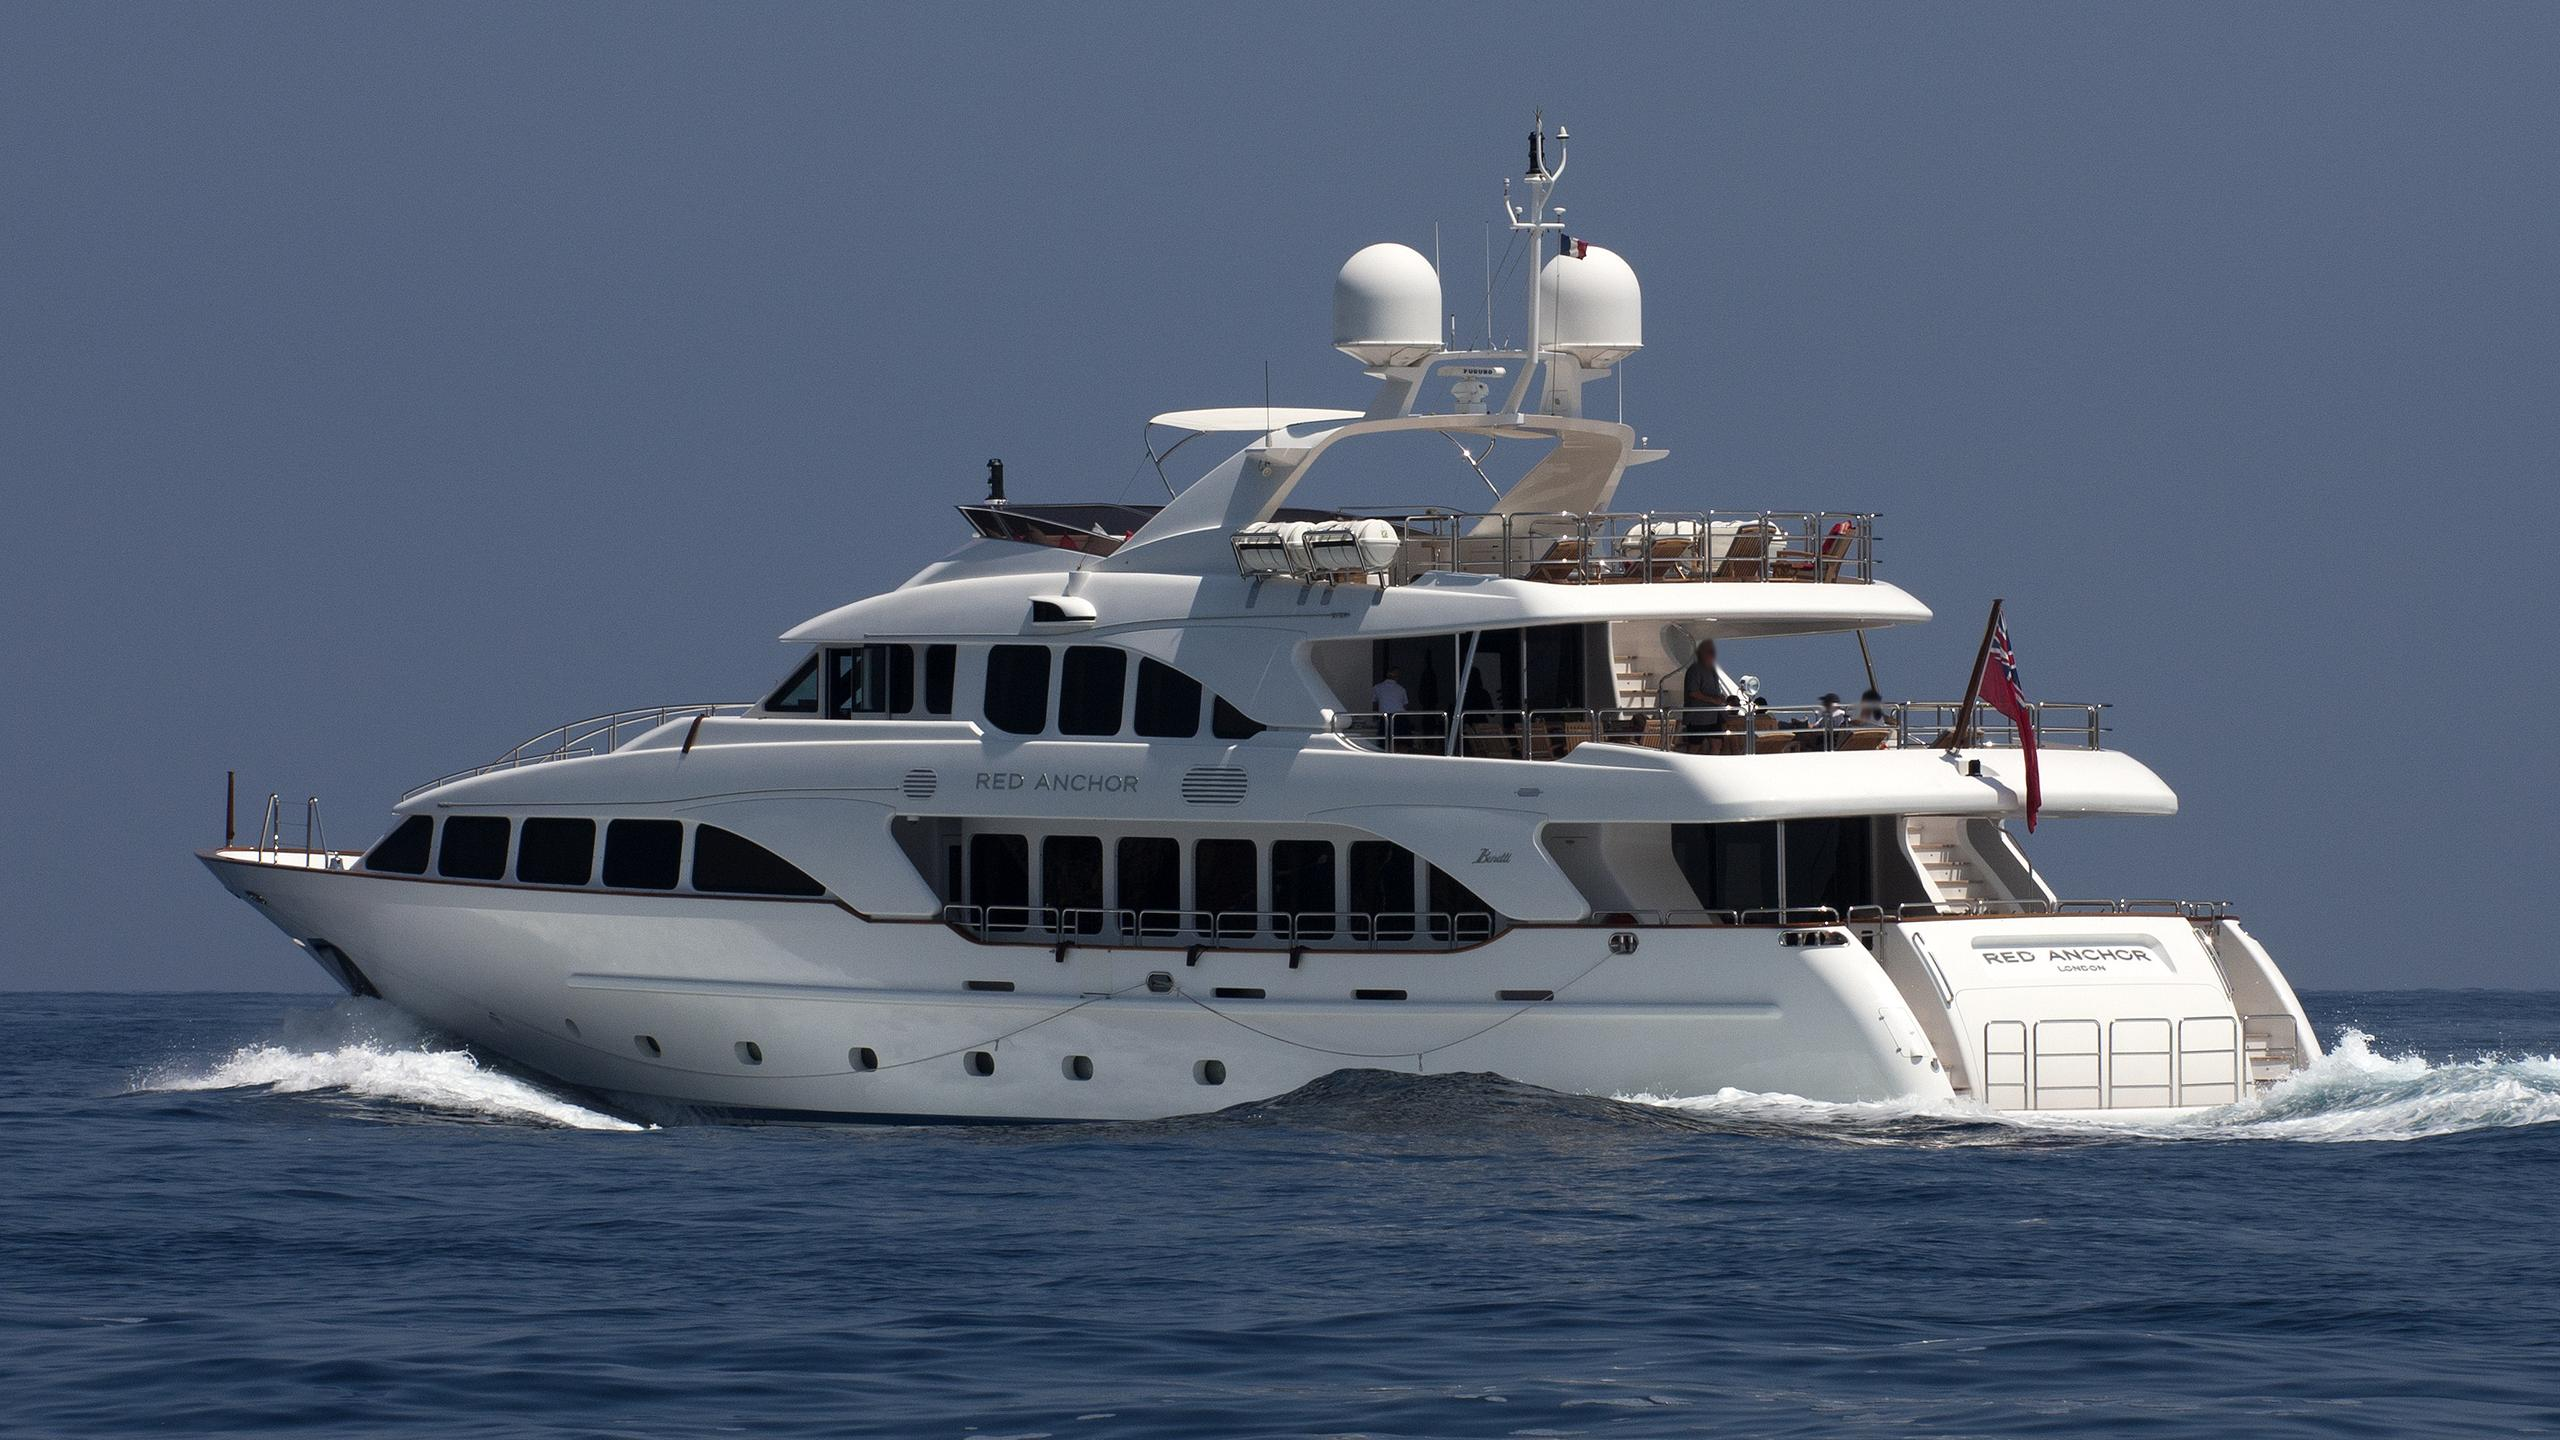 bunty red anchor motoryacht benetti 37m 2009 half stern